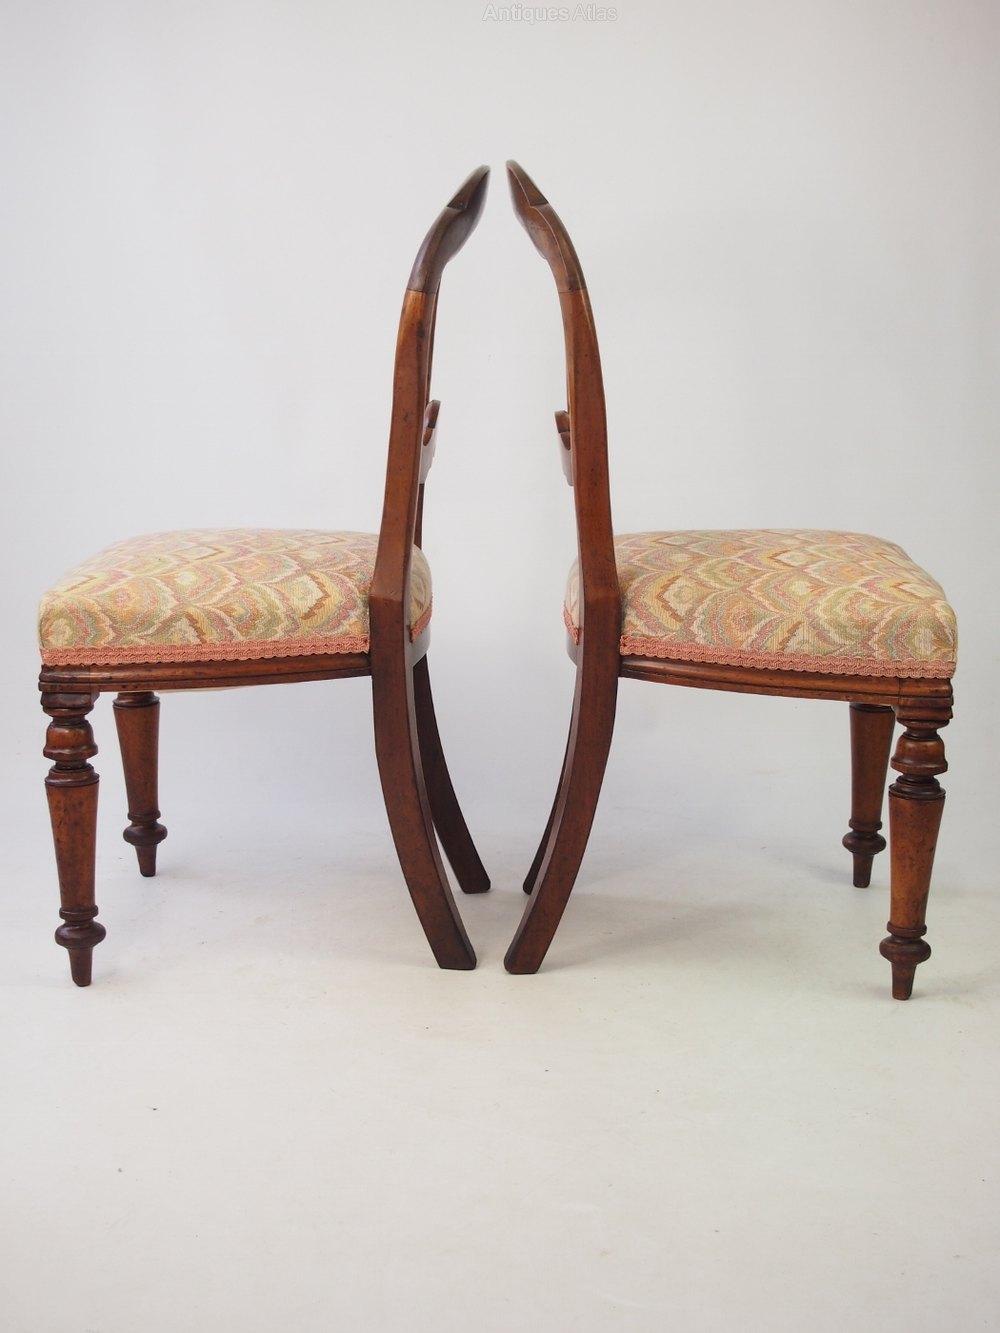 Pair Antique Victorian Balloon Back Chairs Antiques Atlas